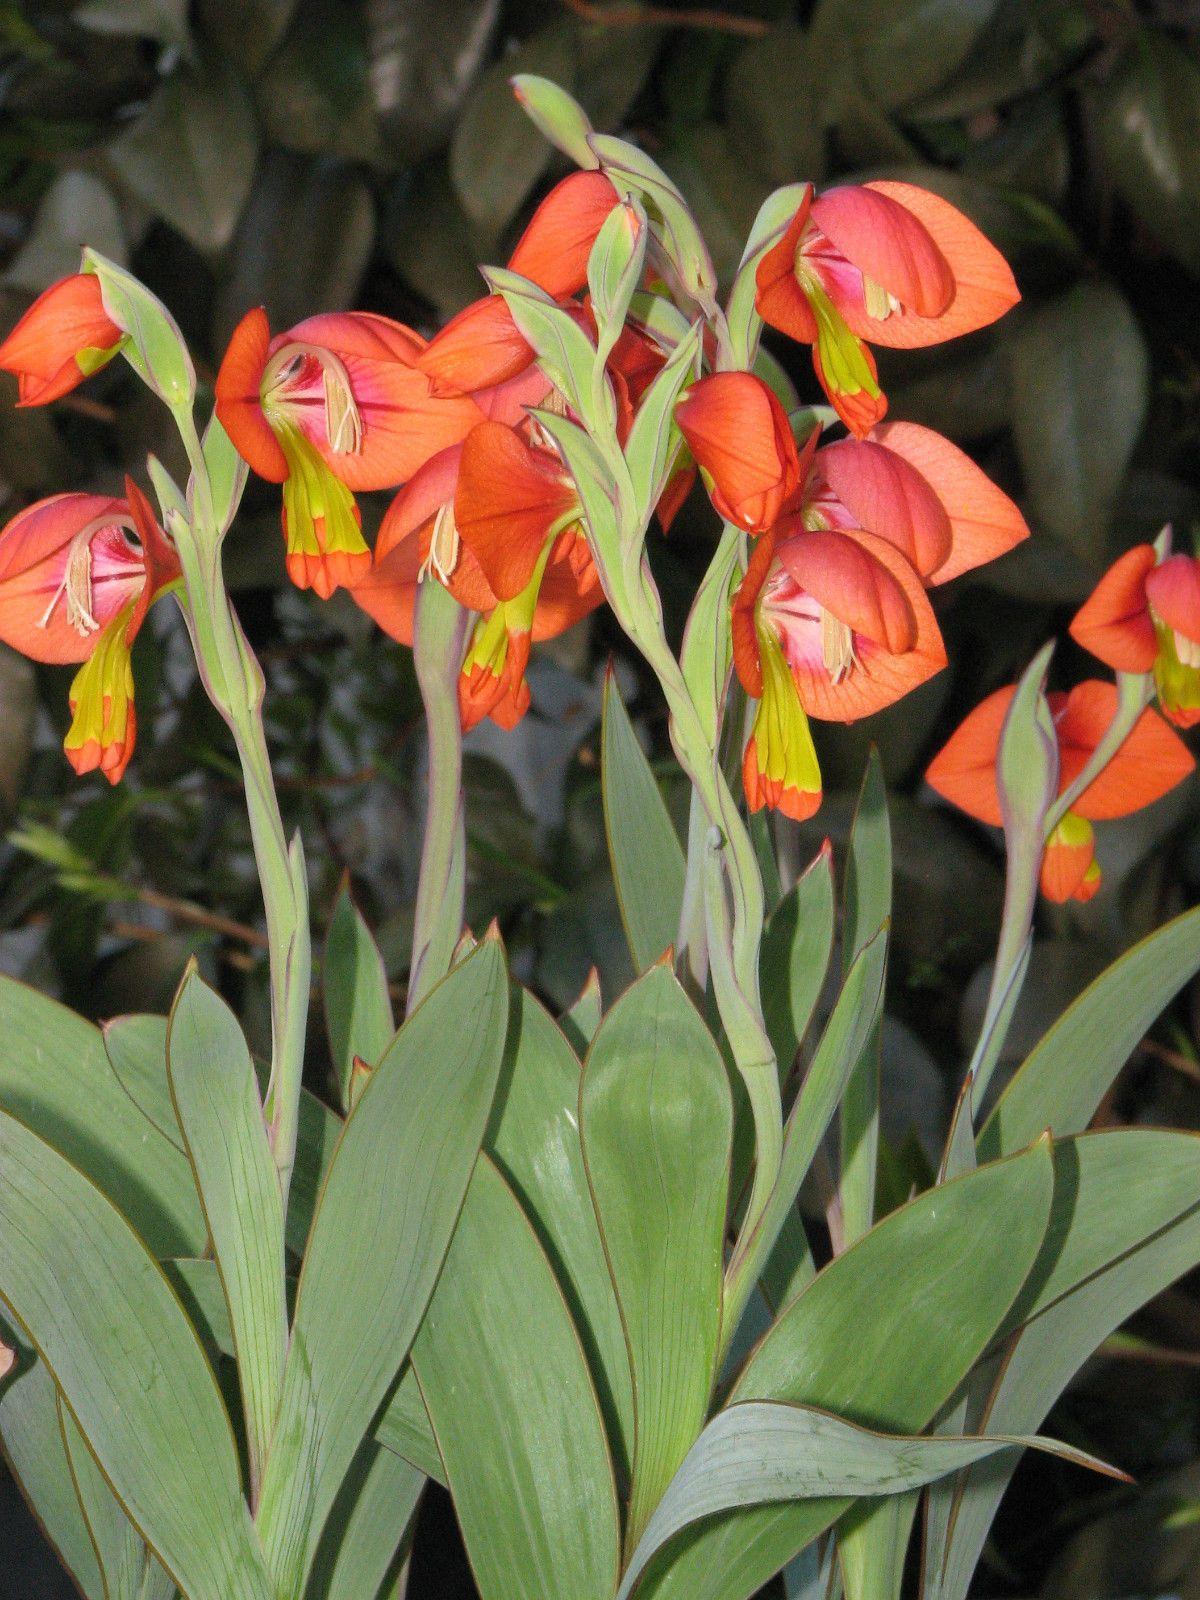 Gladiolus Equitans Kamieskroon FS Near Corm eBay